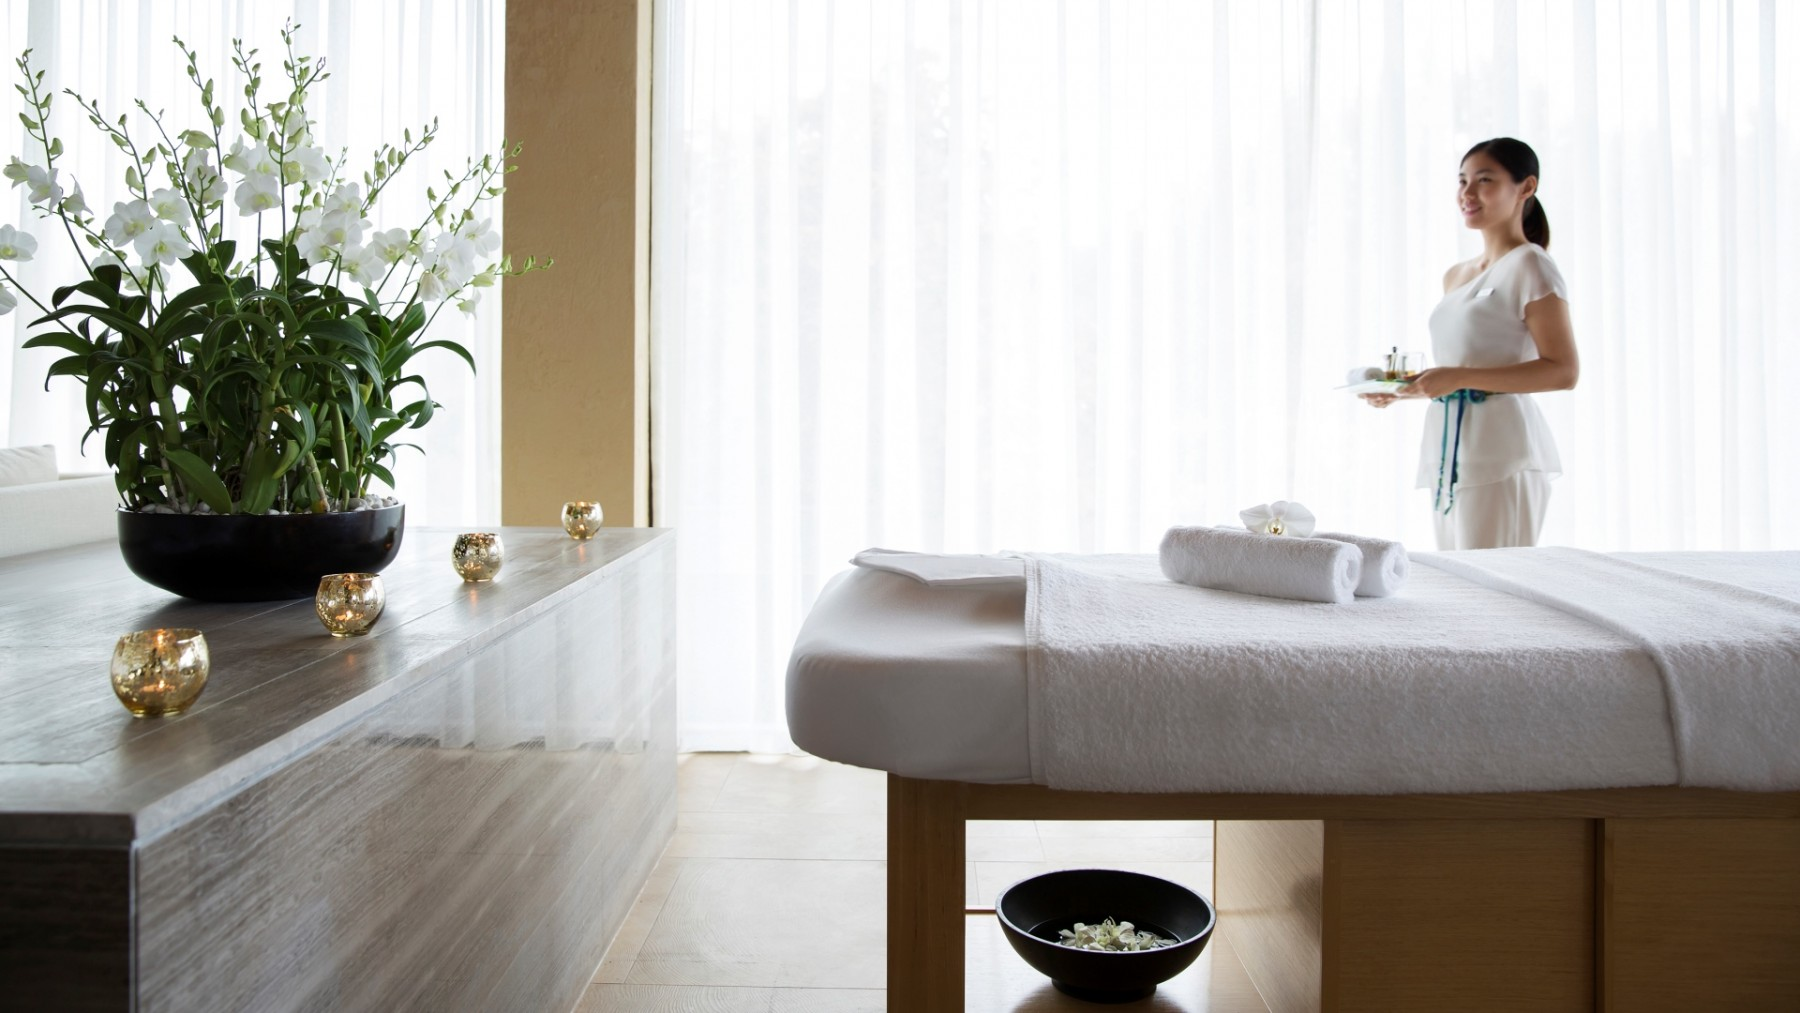 dhatri-spa-promotion